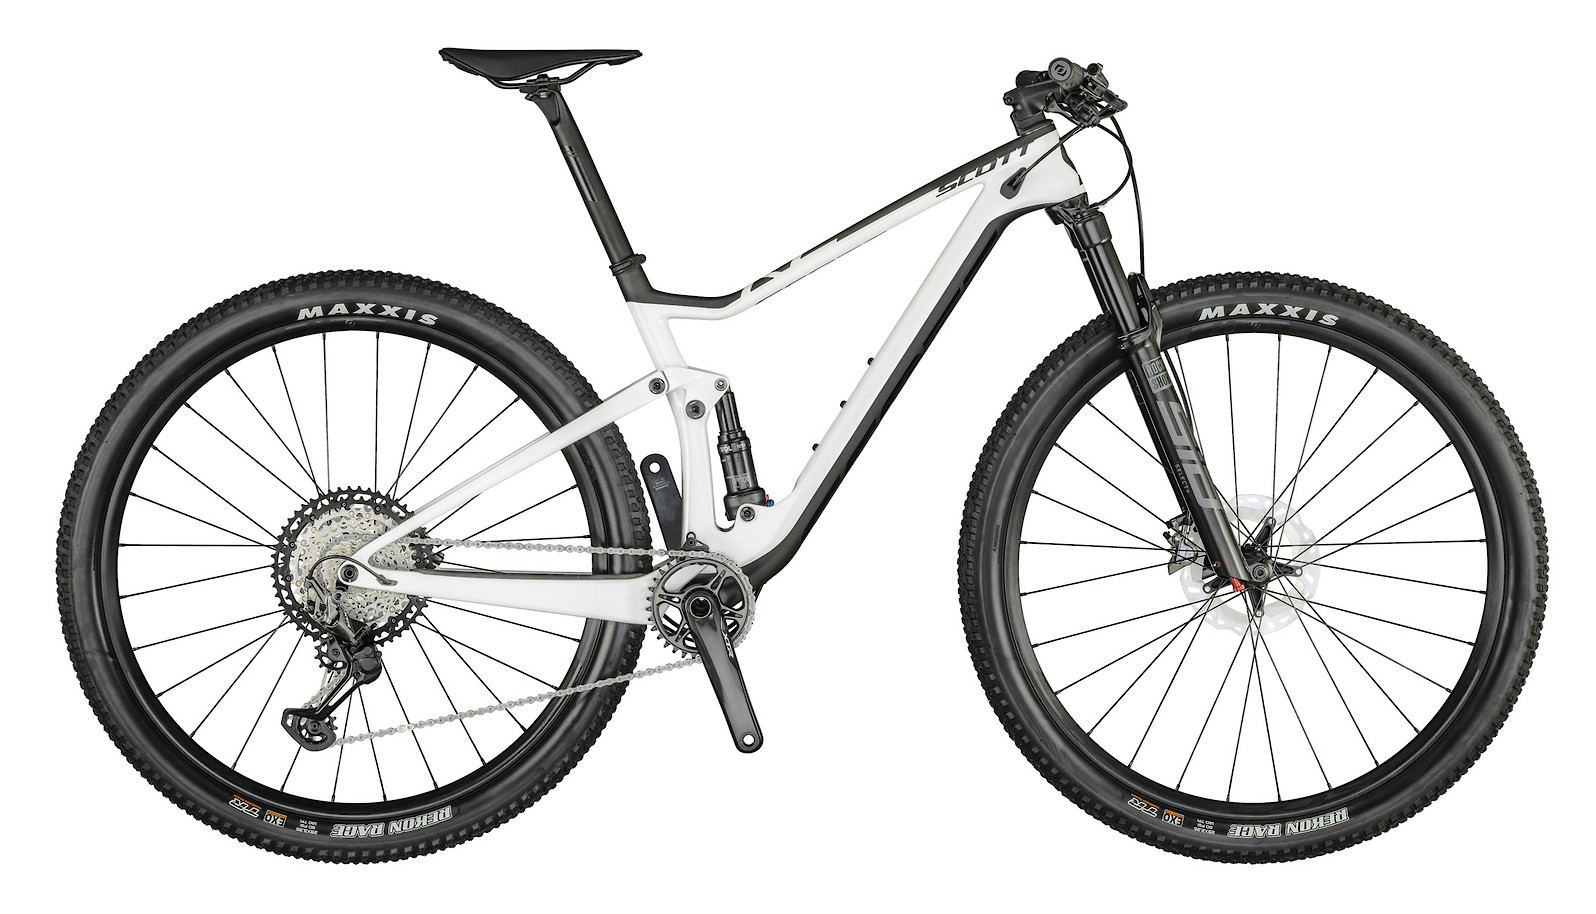 Bicicleta Scott Spark RC 900 World Cup 2021 - Bike Point SC